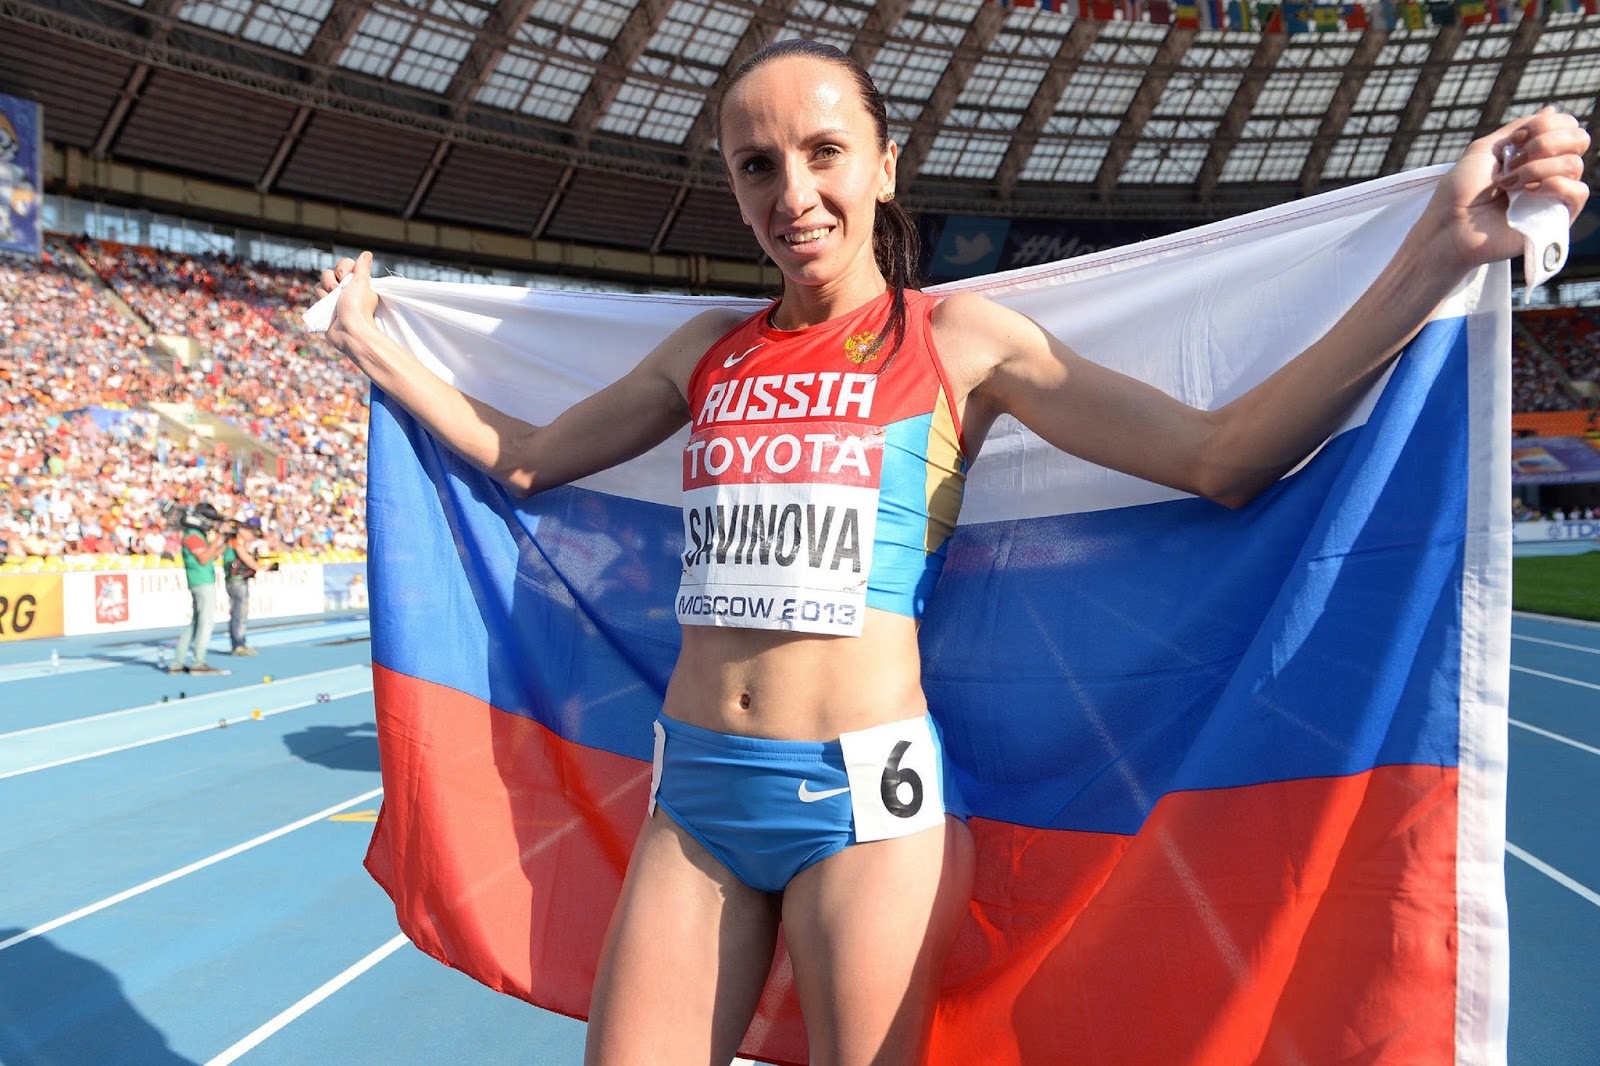 RUSSIA 2016 OLYMPICS 2